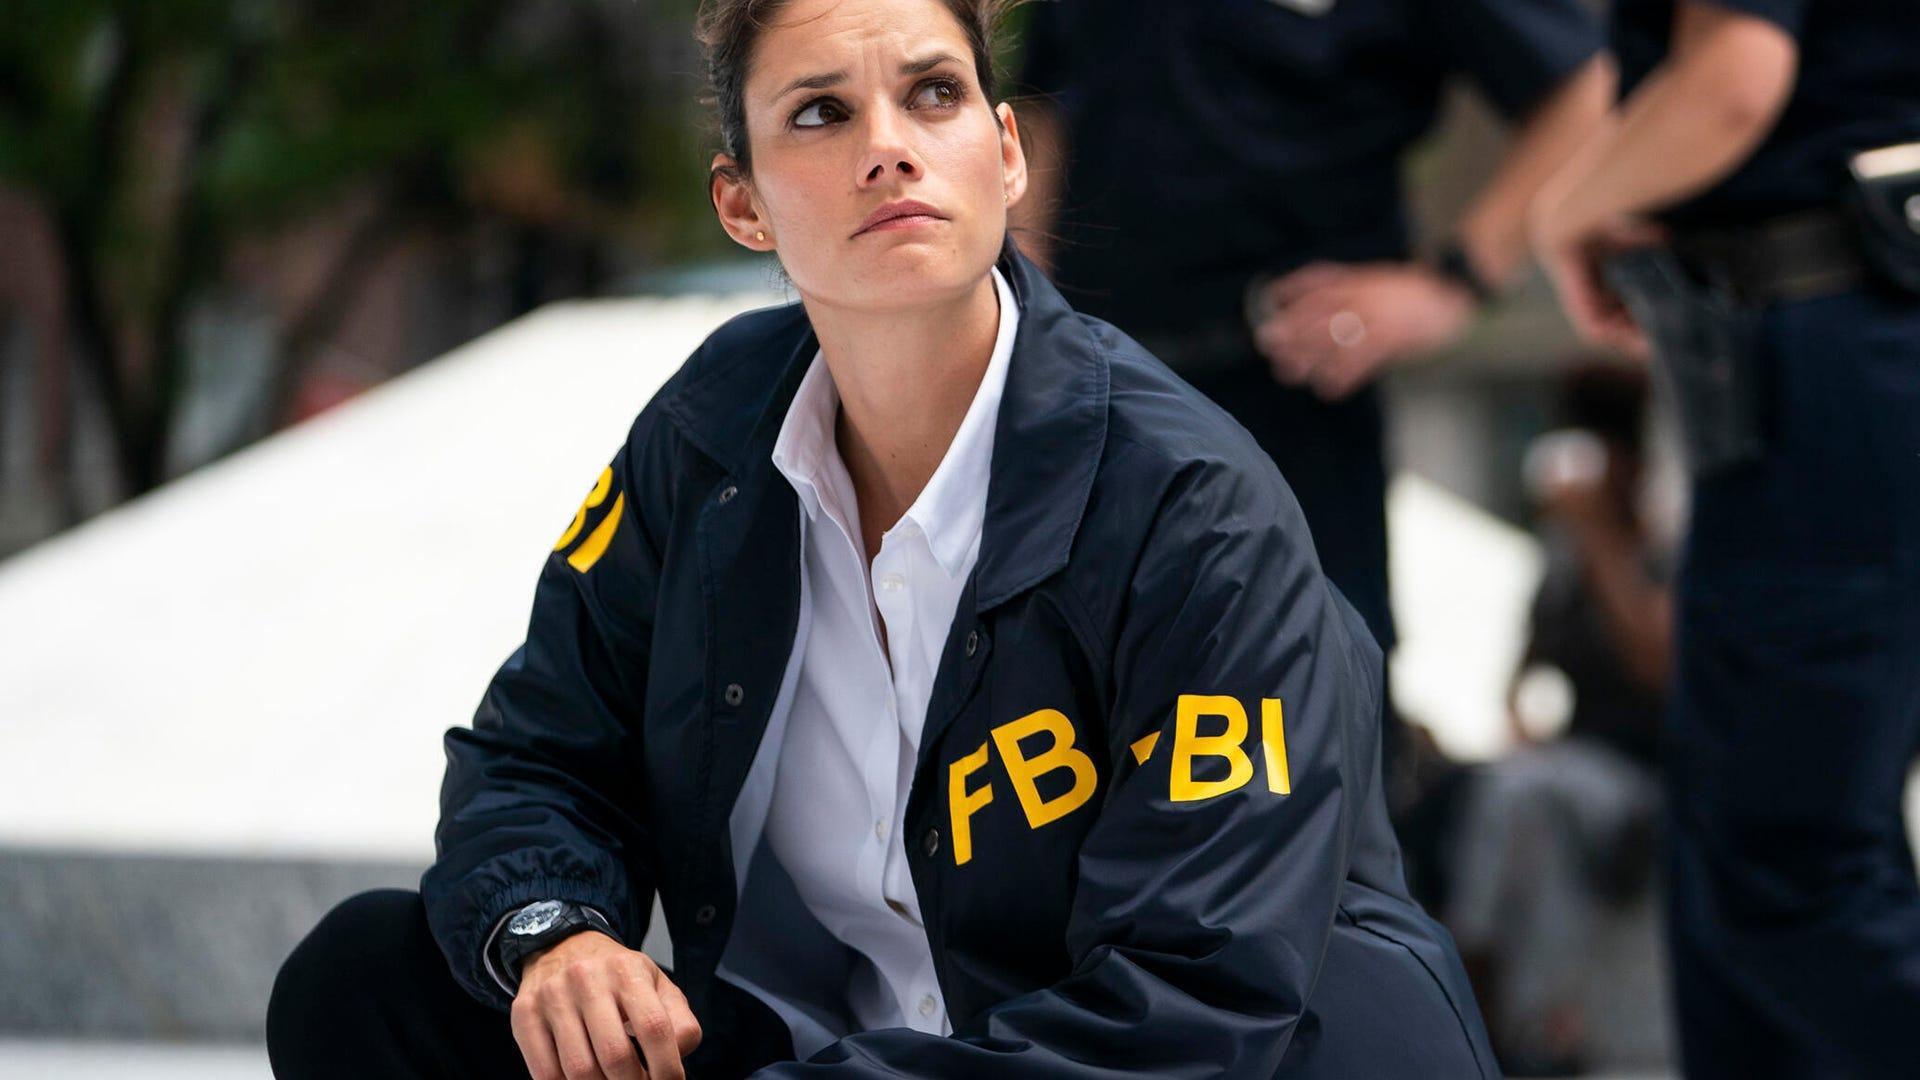 Missy Peregrym, FBI